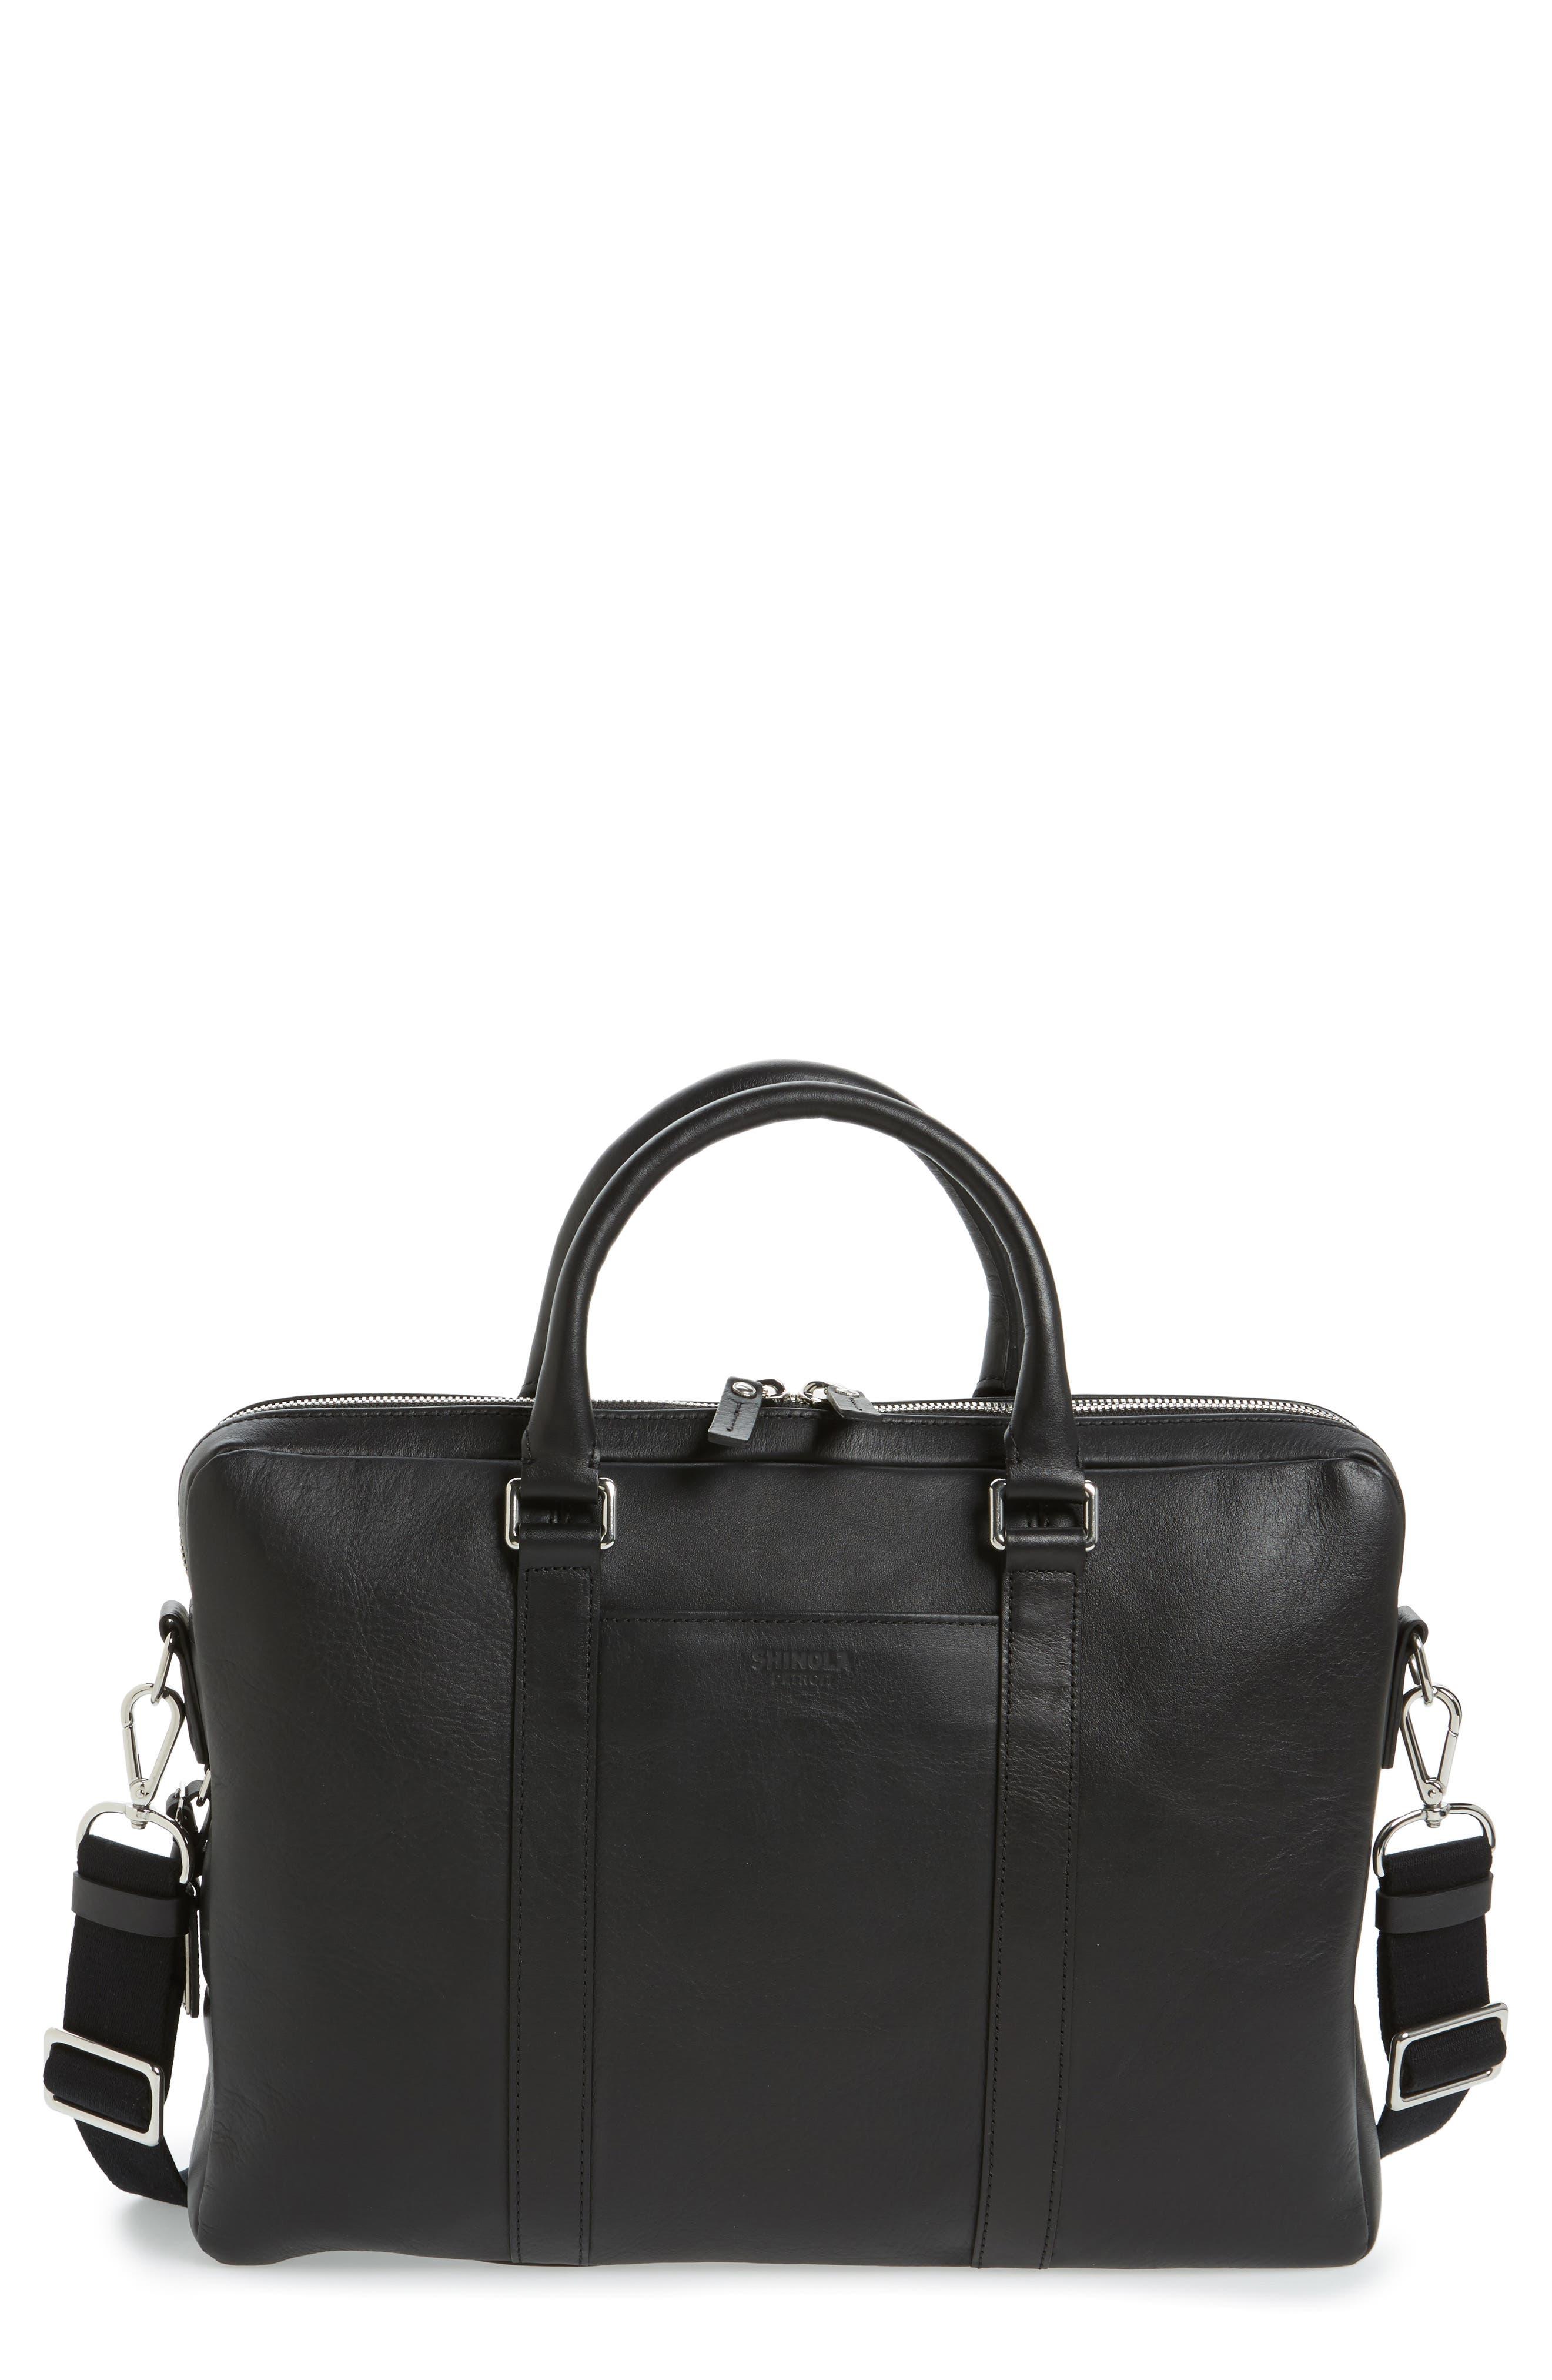 Alternate Image 1 Selected - Shinola Signature Leather Briefcase